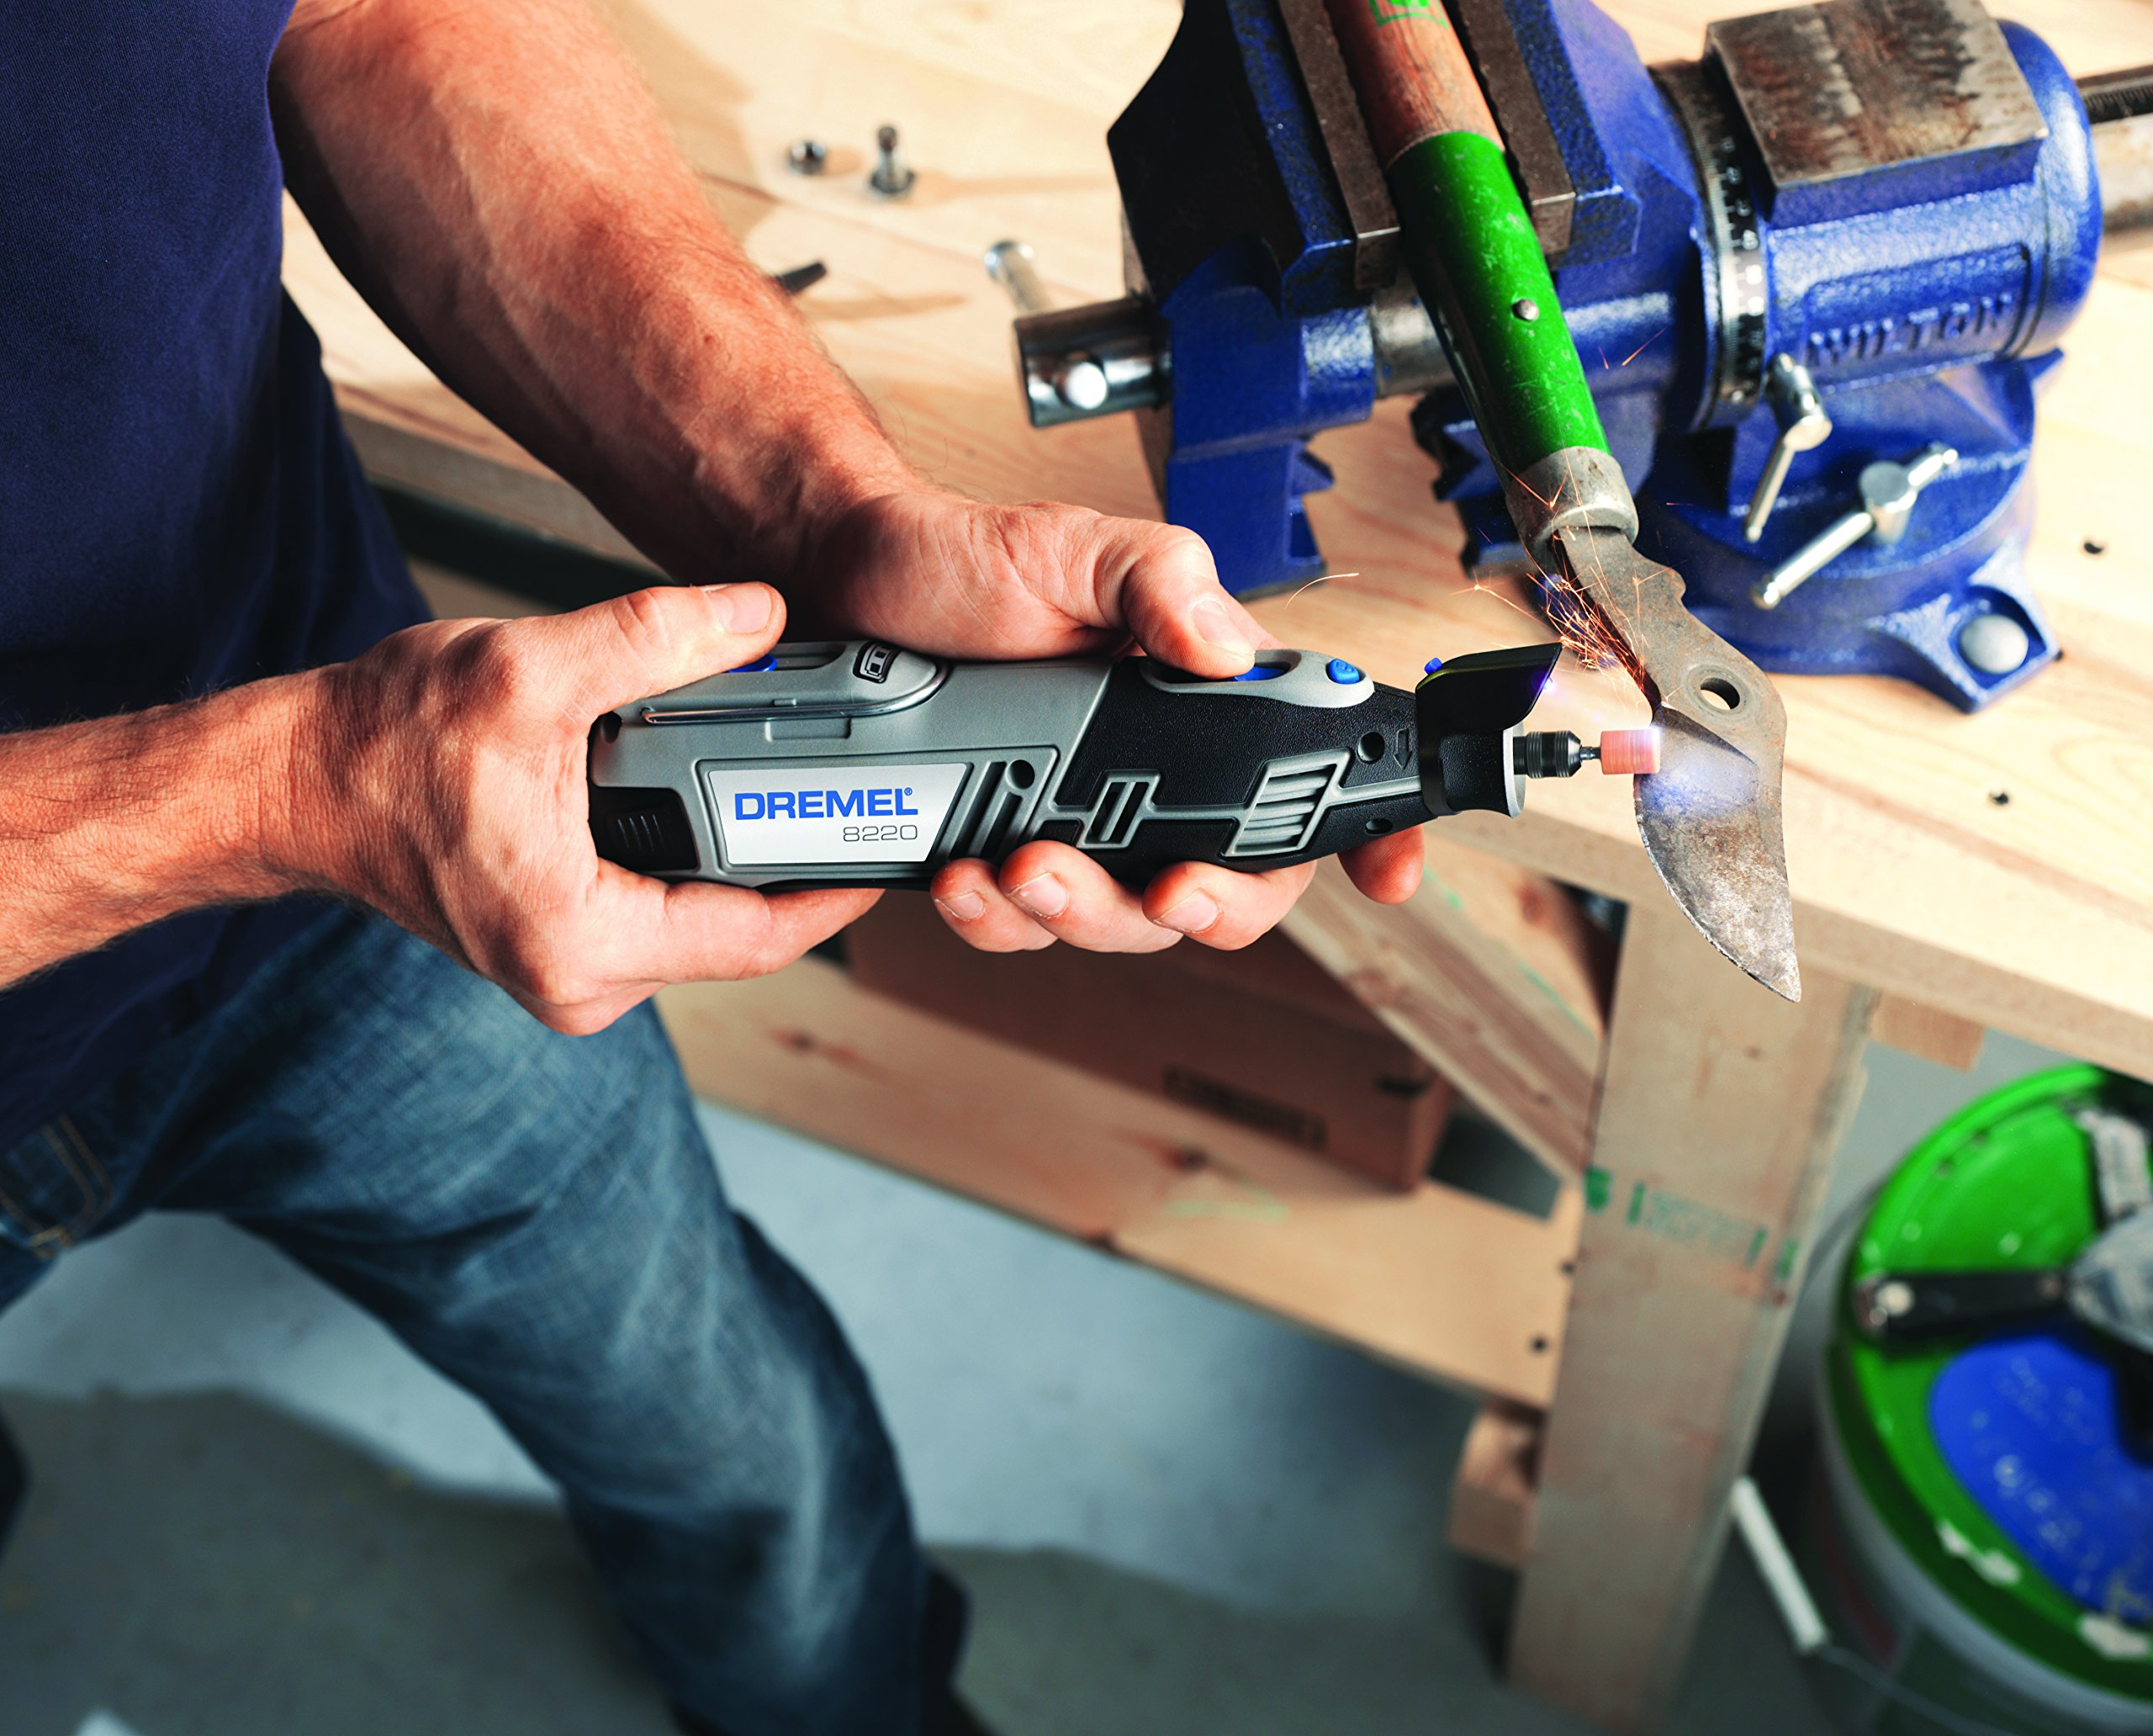 DREMEL 8220-2/45 F0138220JG 12v Multi tool - Howe Tools UK